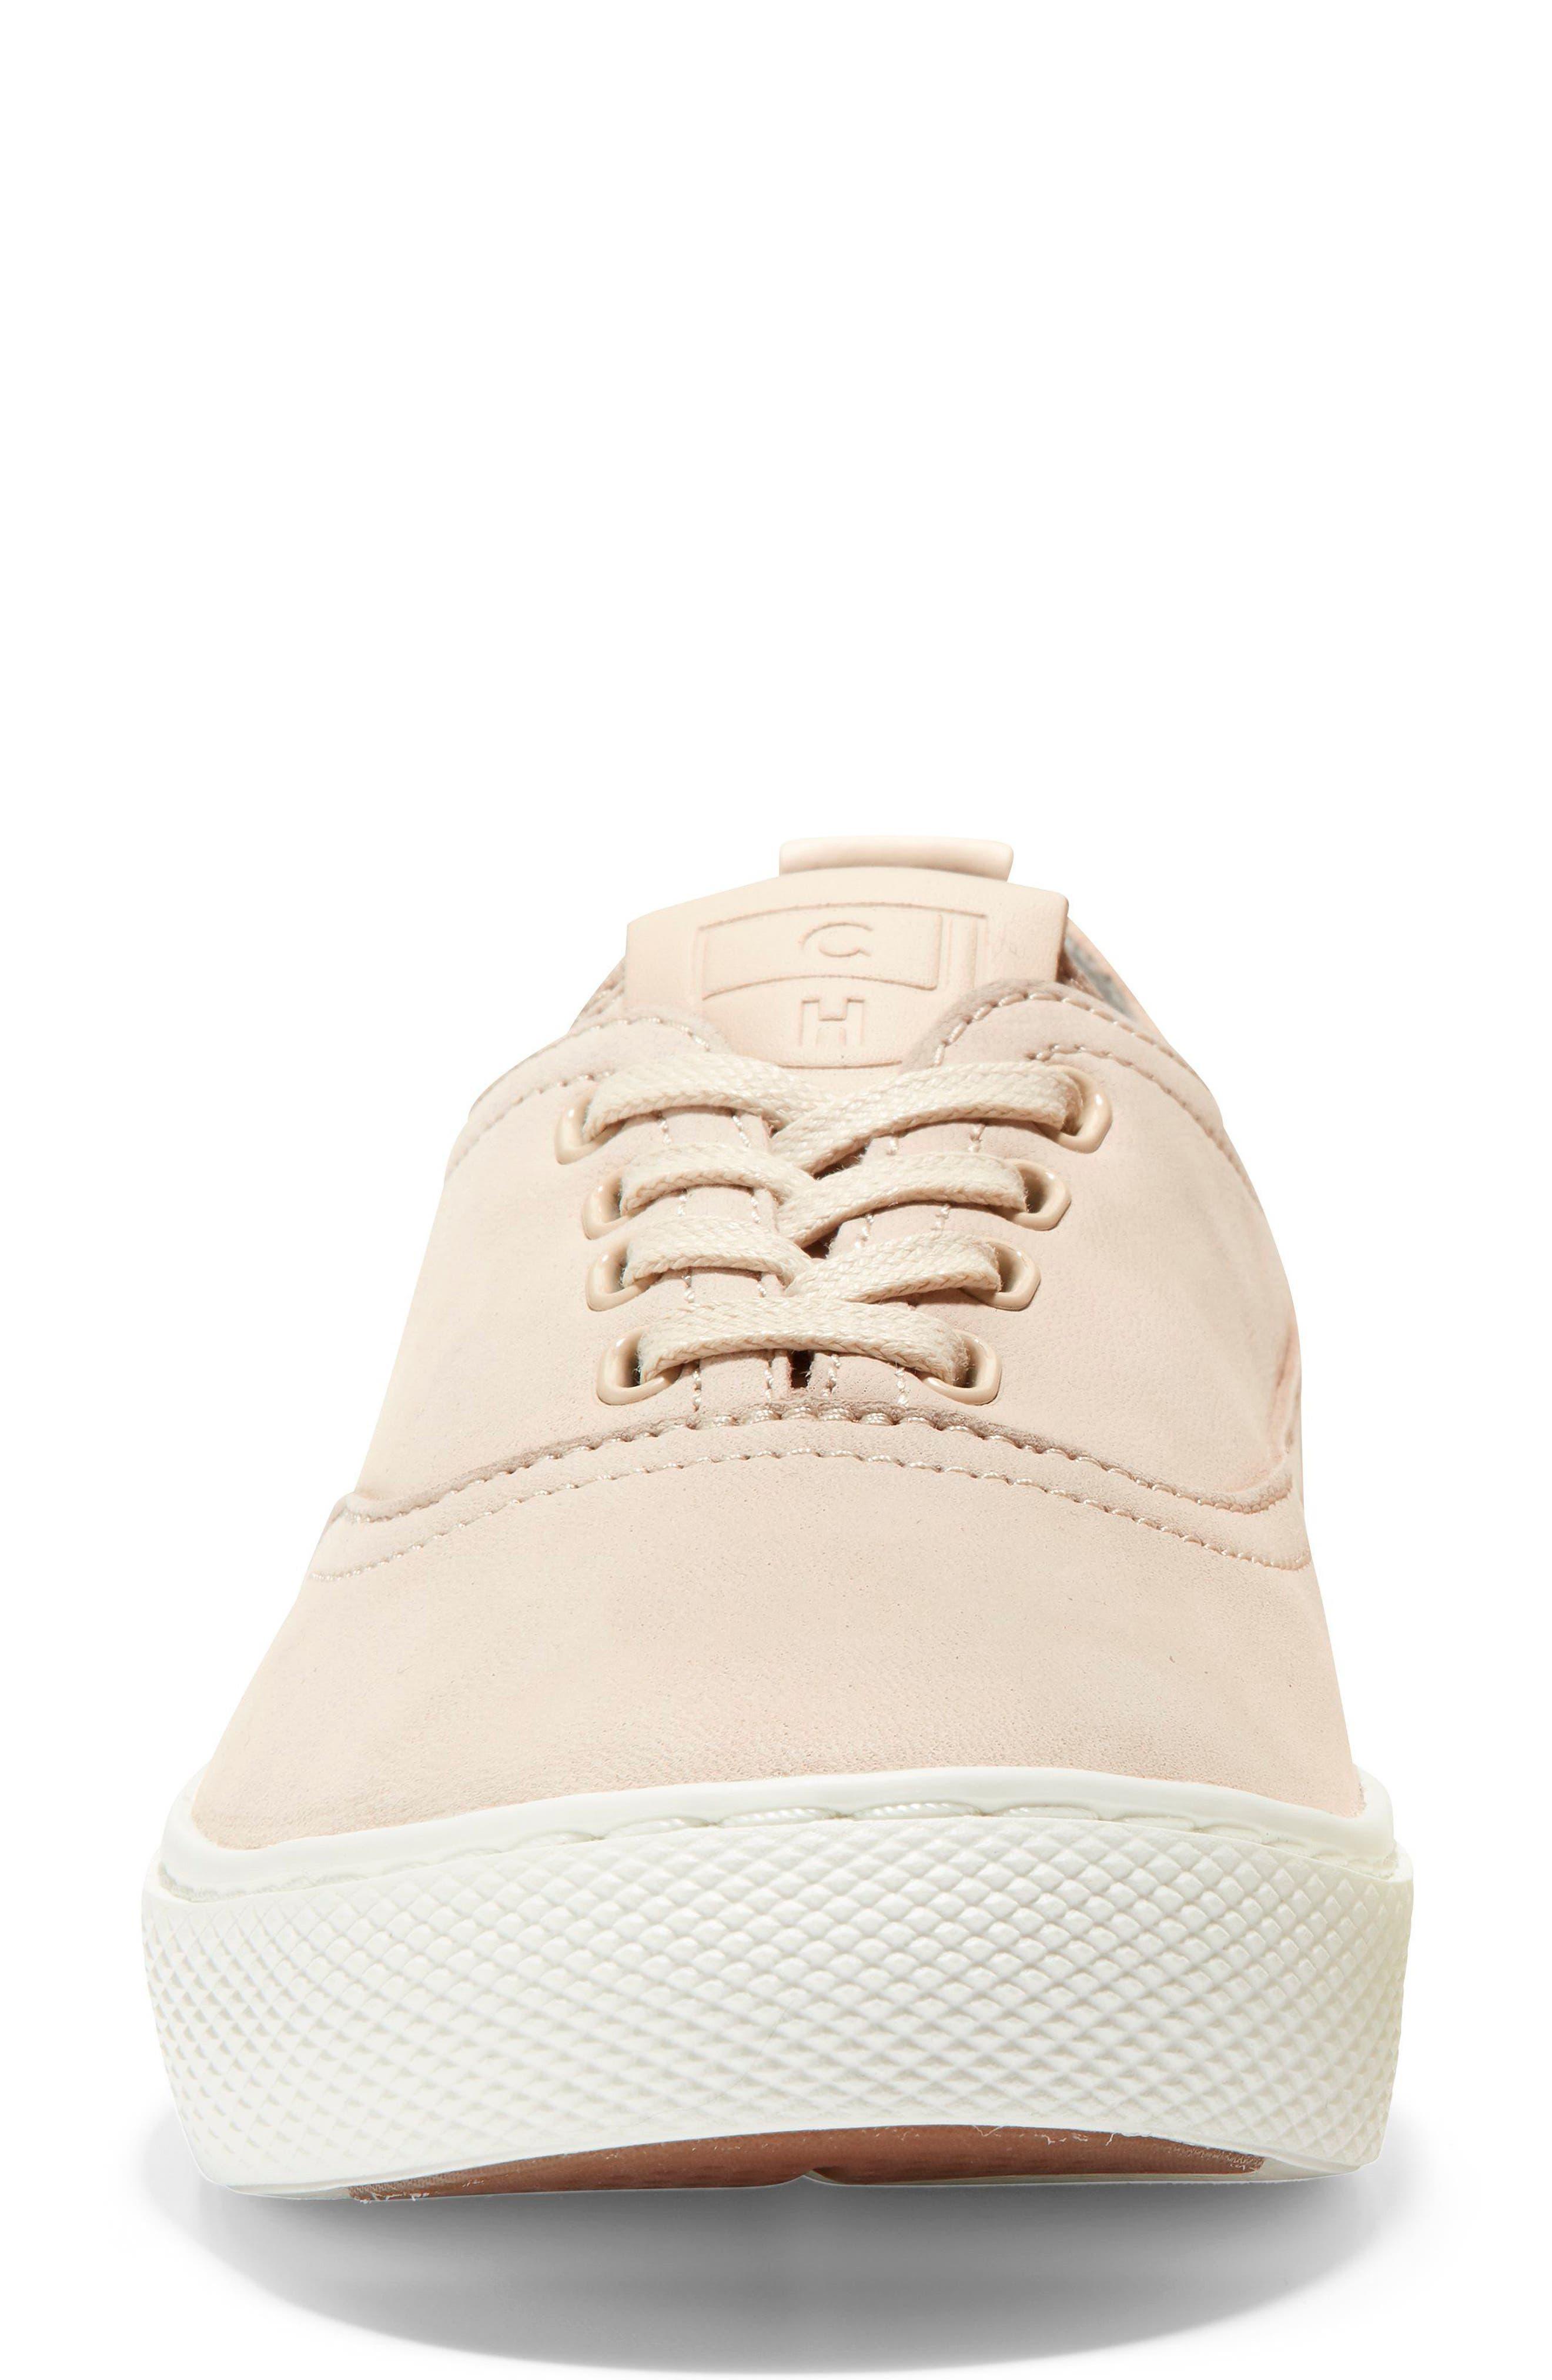 GrandPro Deck Sneaker,                             Alternate thumbnail 4, color,                             250